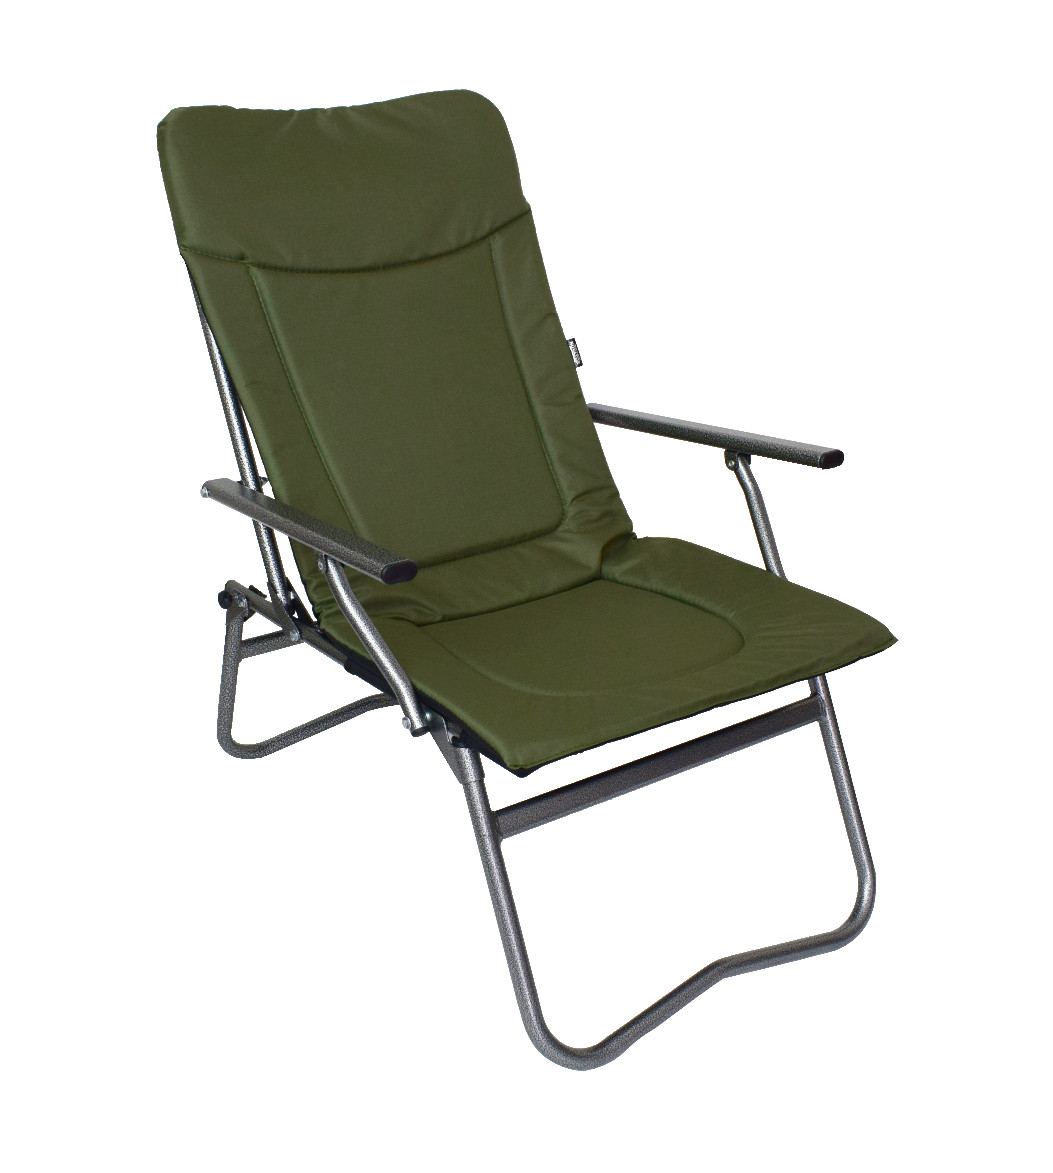 Крісло складне коропове Vario Basic